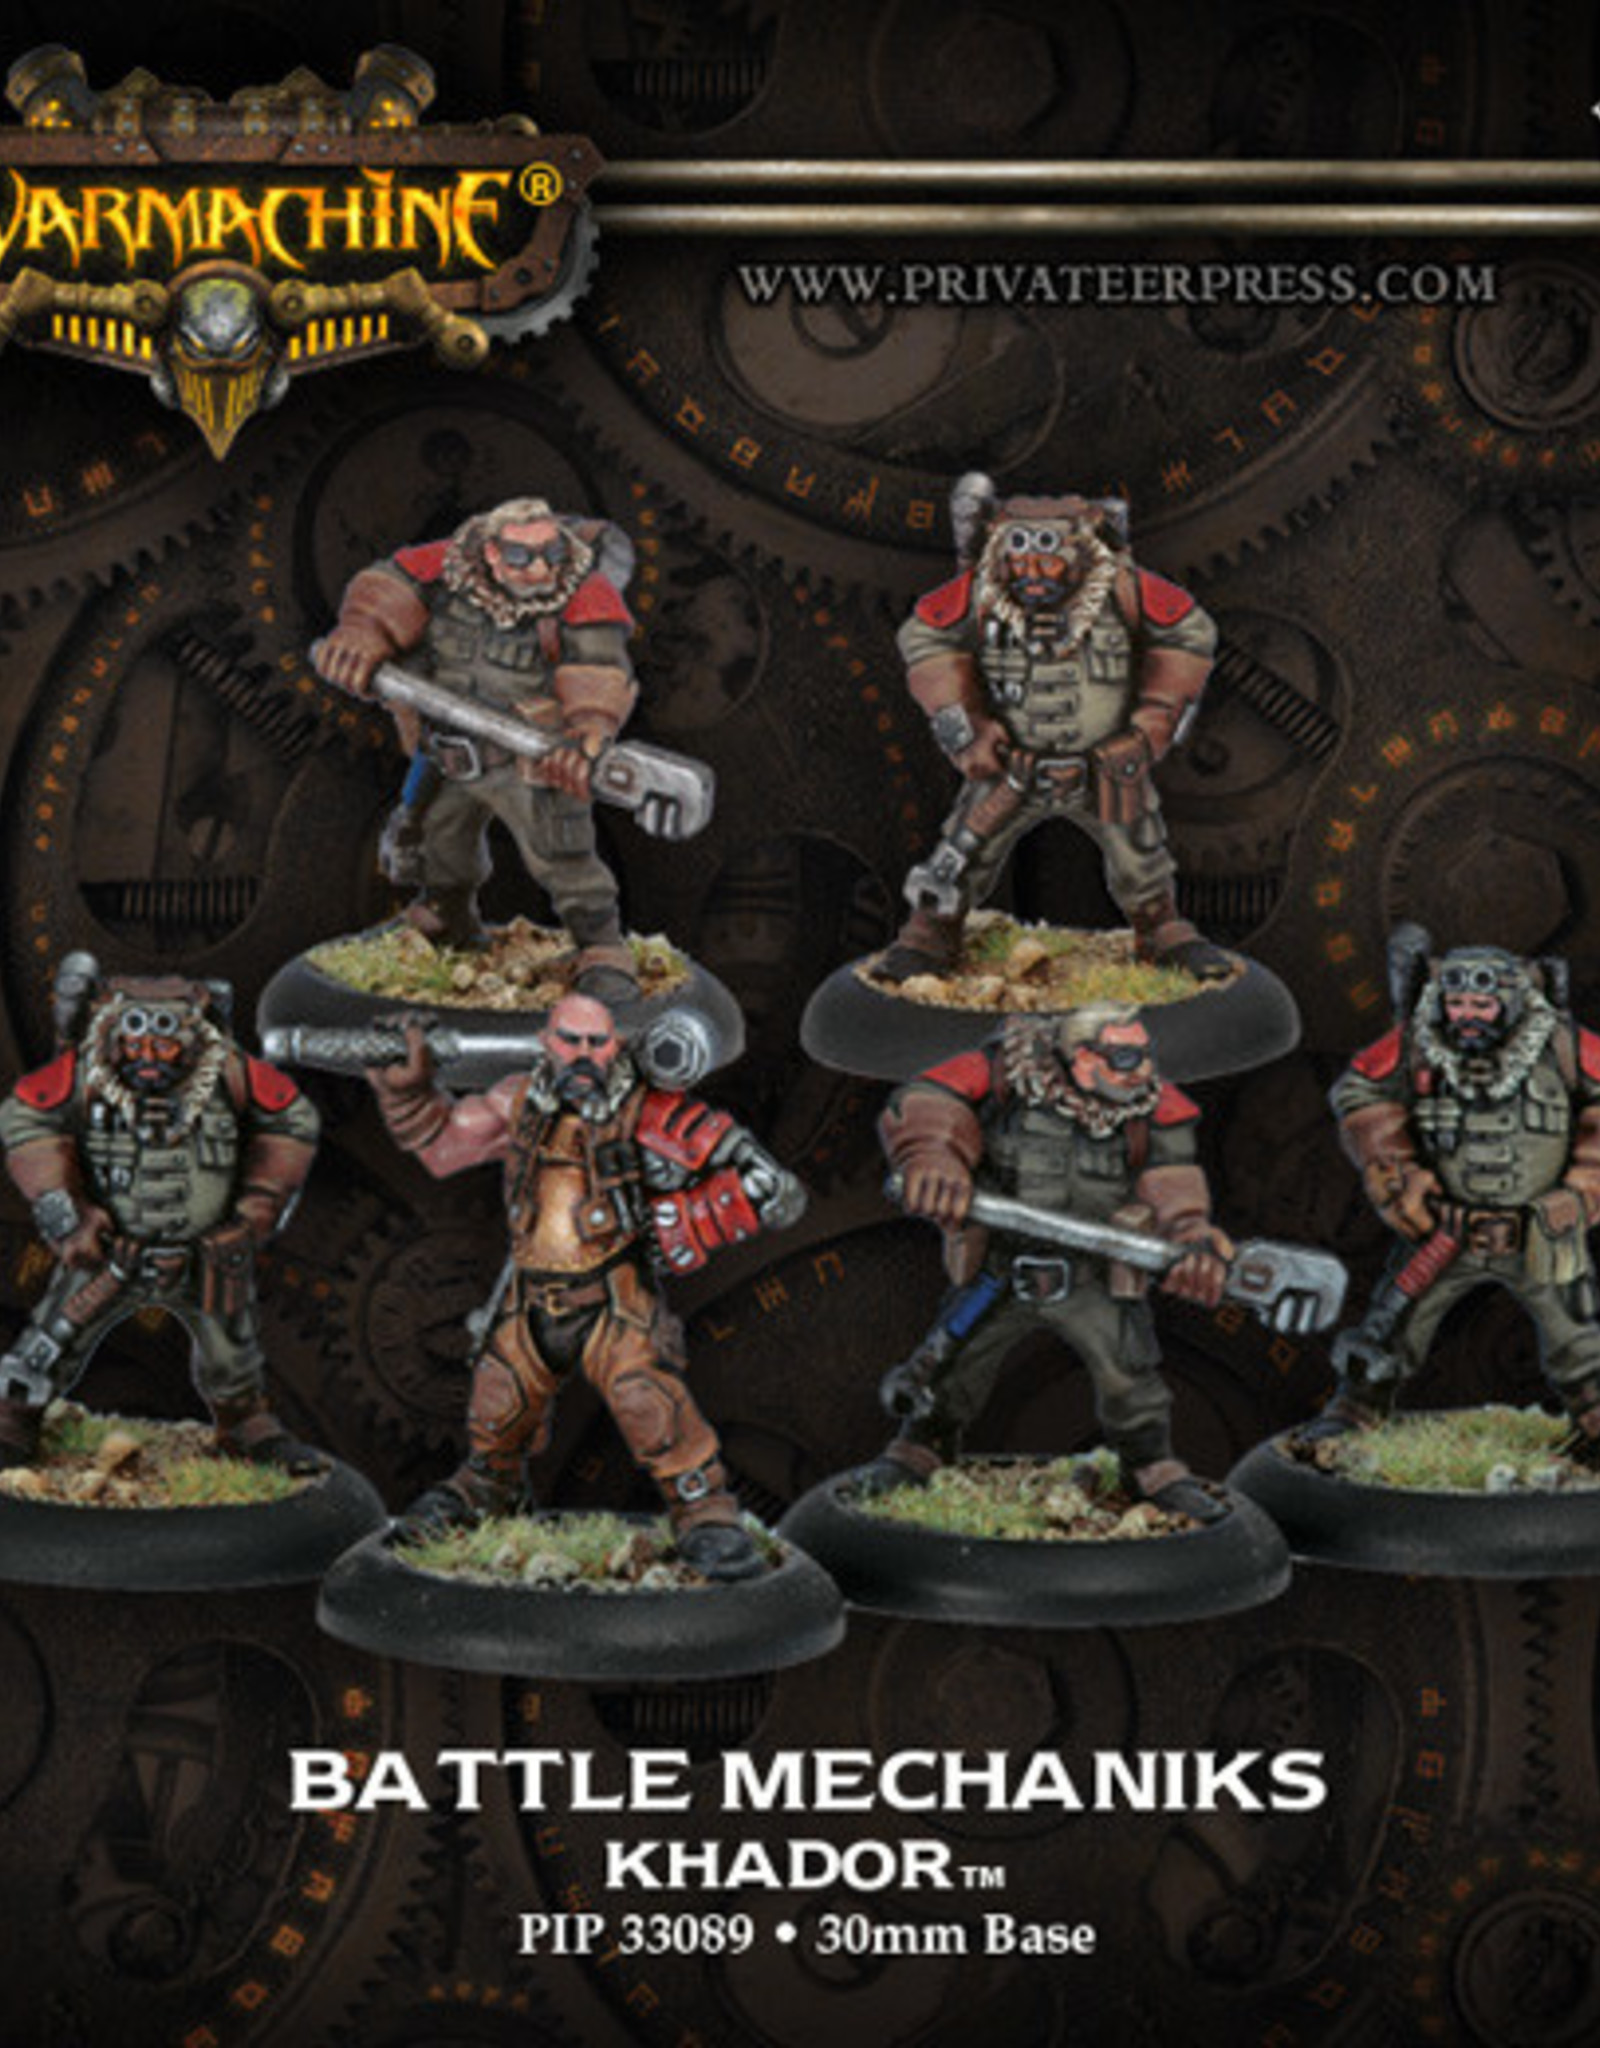 Warmachine Khador - Battle Mechaniks